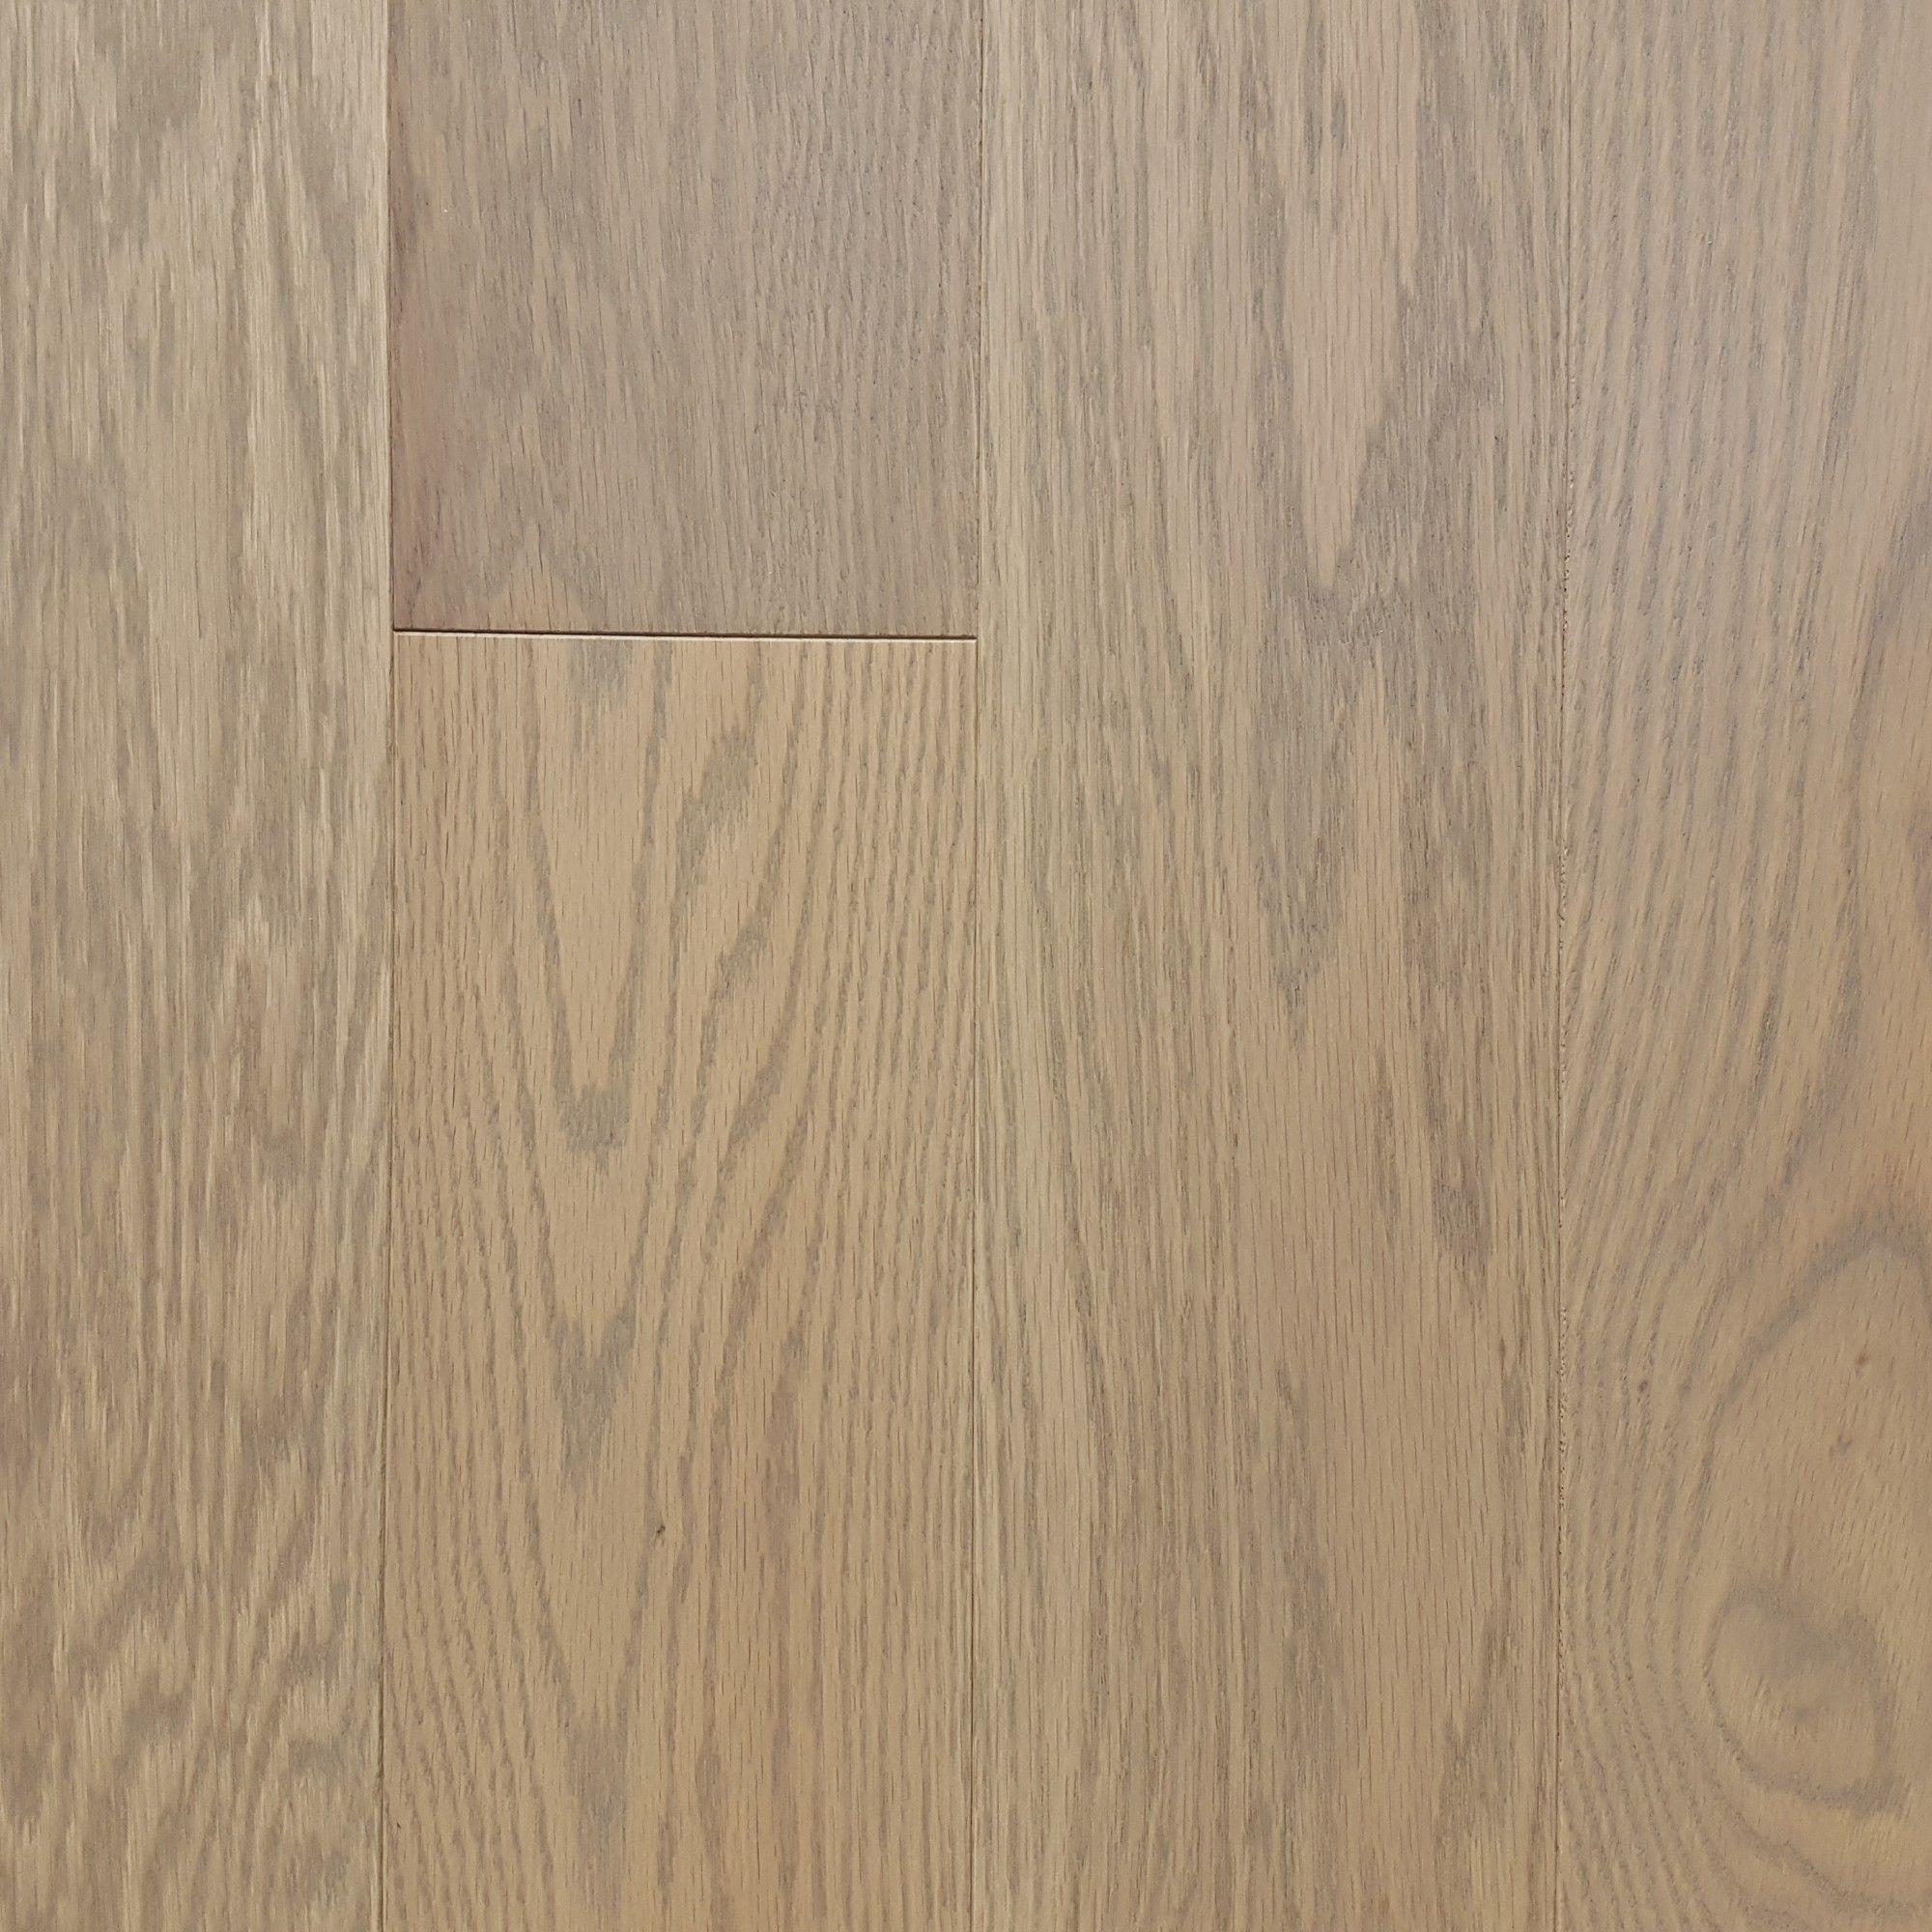 adhesive for engineered hardwood flooring of red oak baja vintage prefinished hardwood flooring low voc with red oak baja vintage prefinished hardwood flooring low voc take back